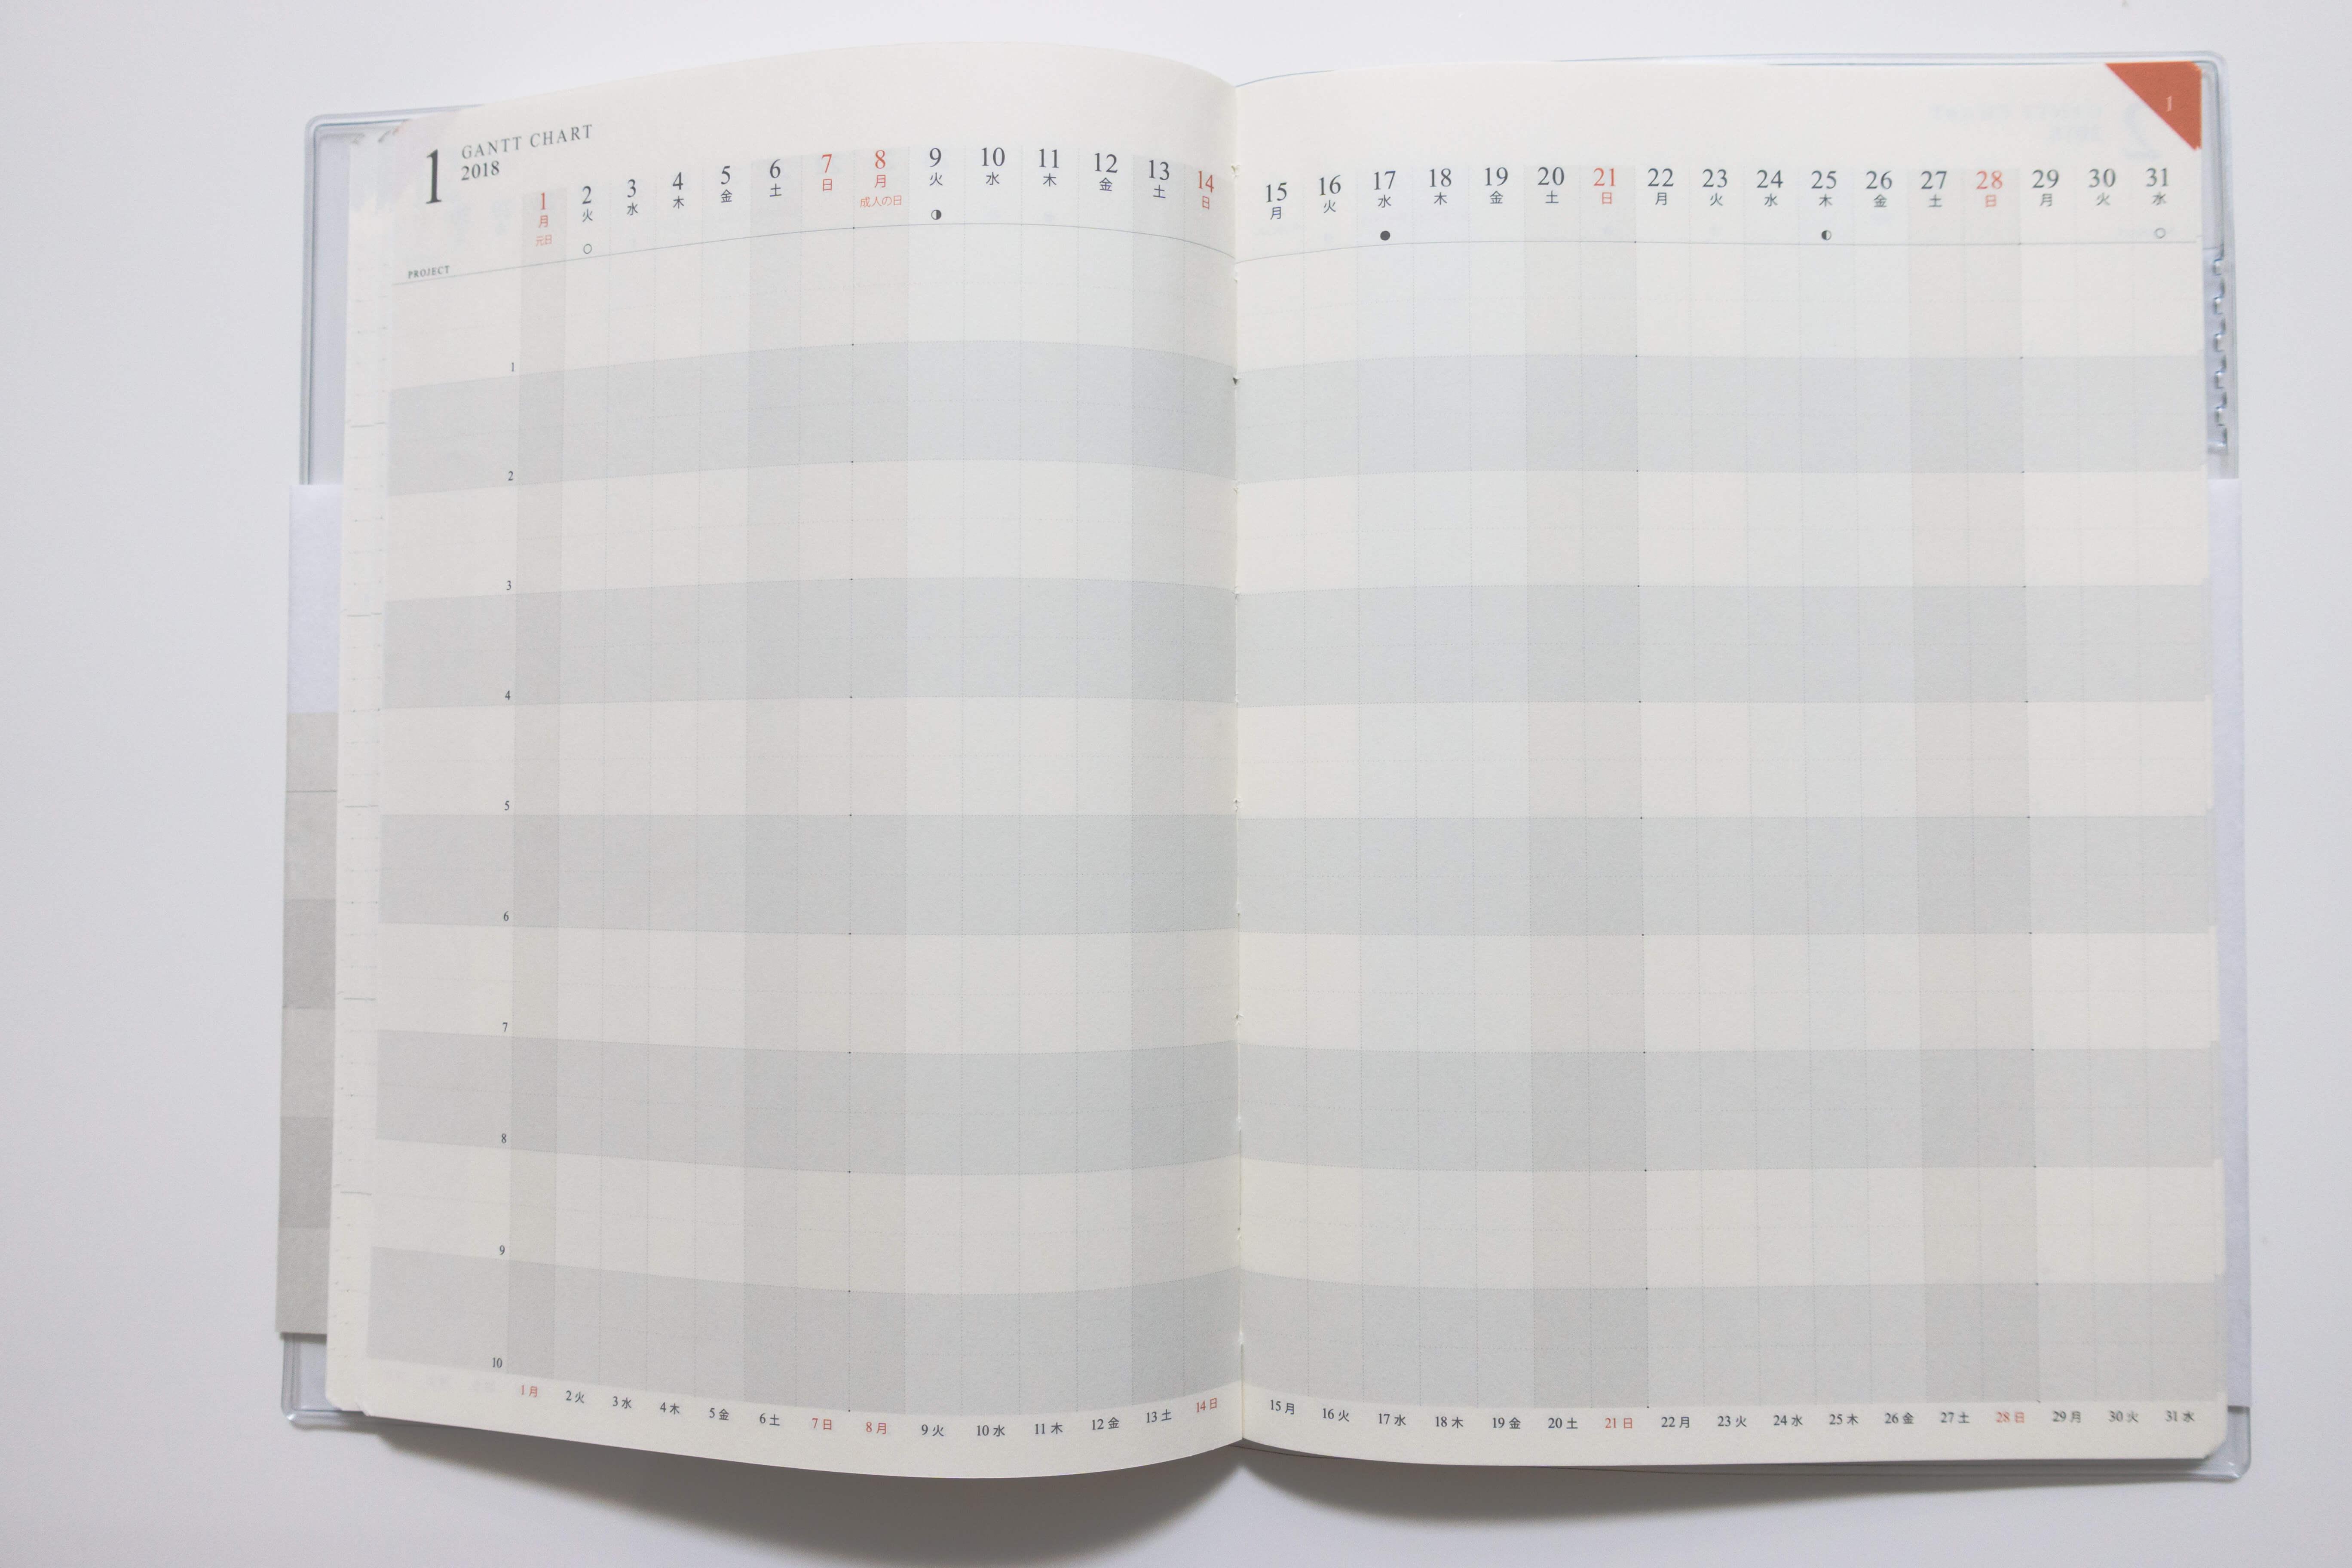 180107 gant chart diary 07